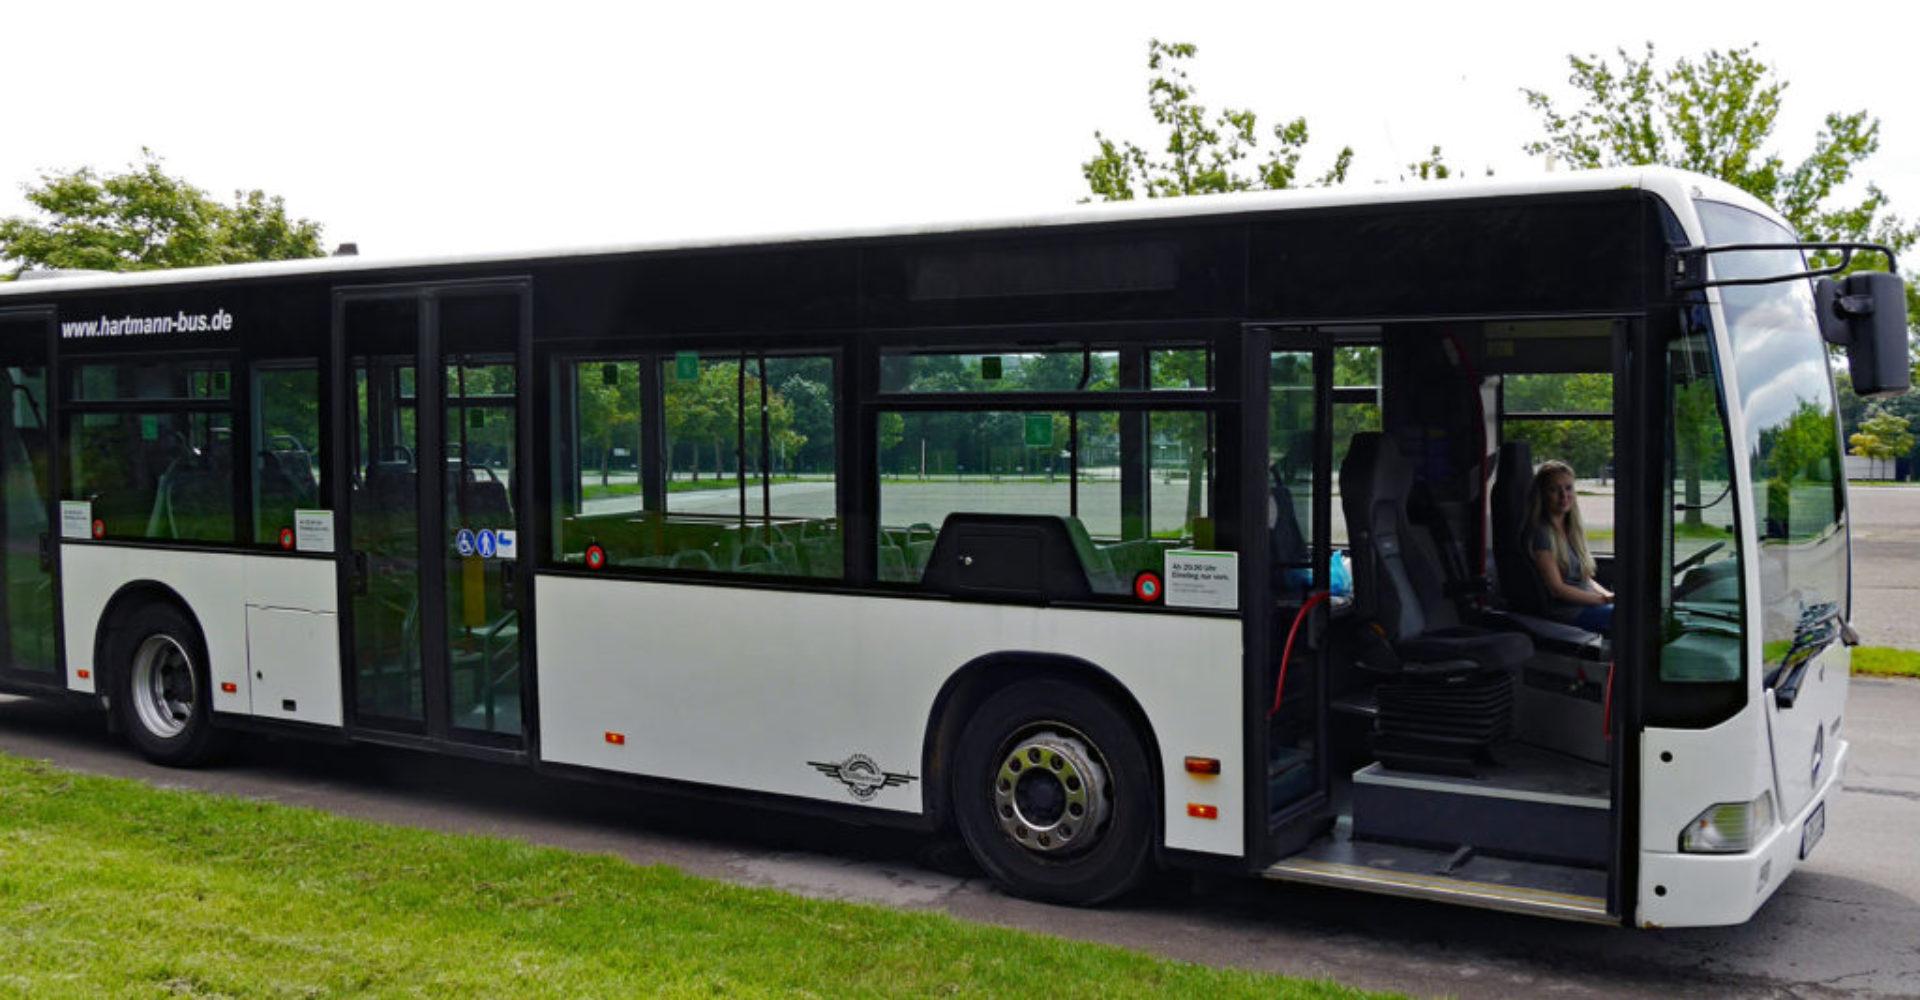 anmietung-fahrschulbus-2